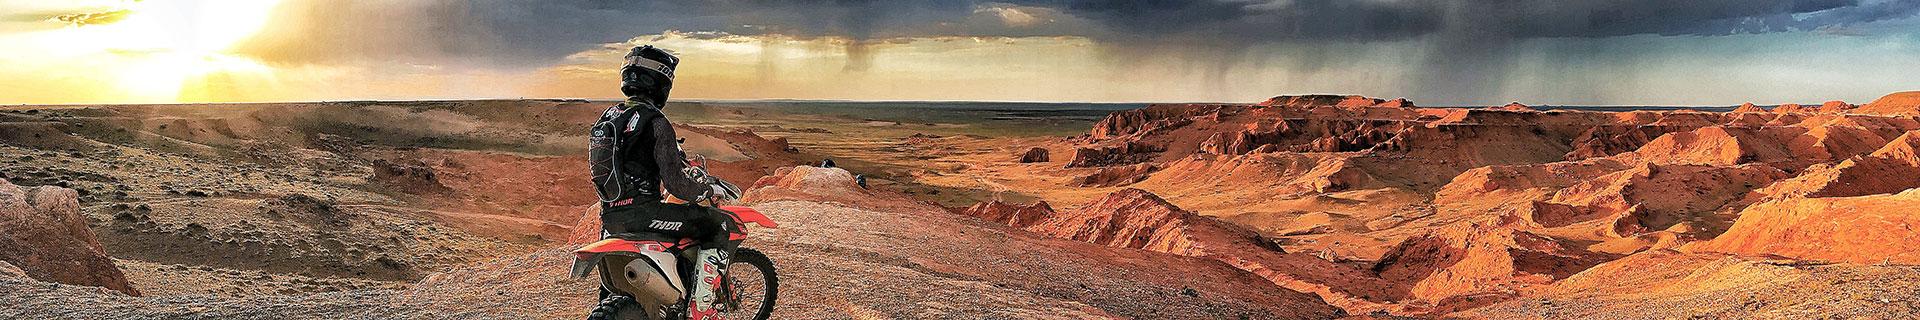 mongolei-enduro-reise-slider-01